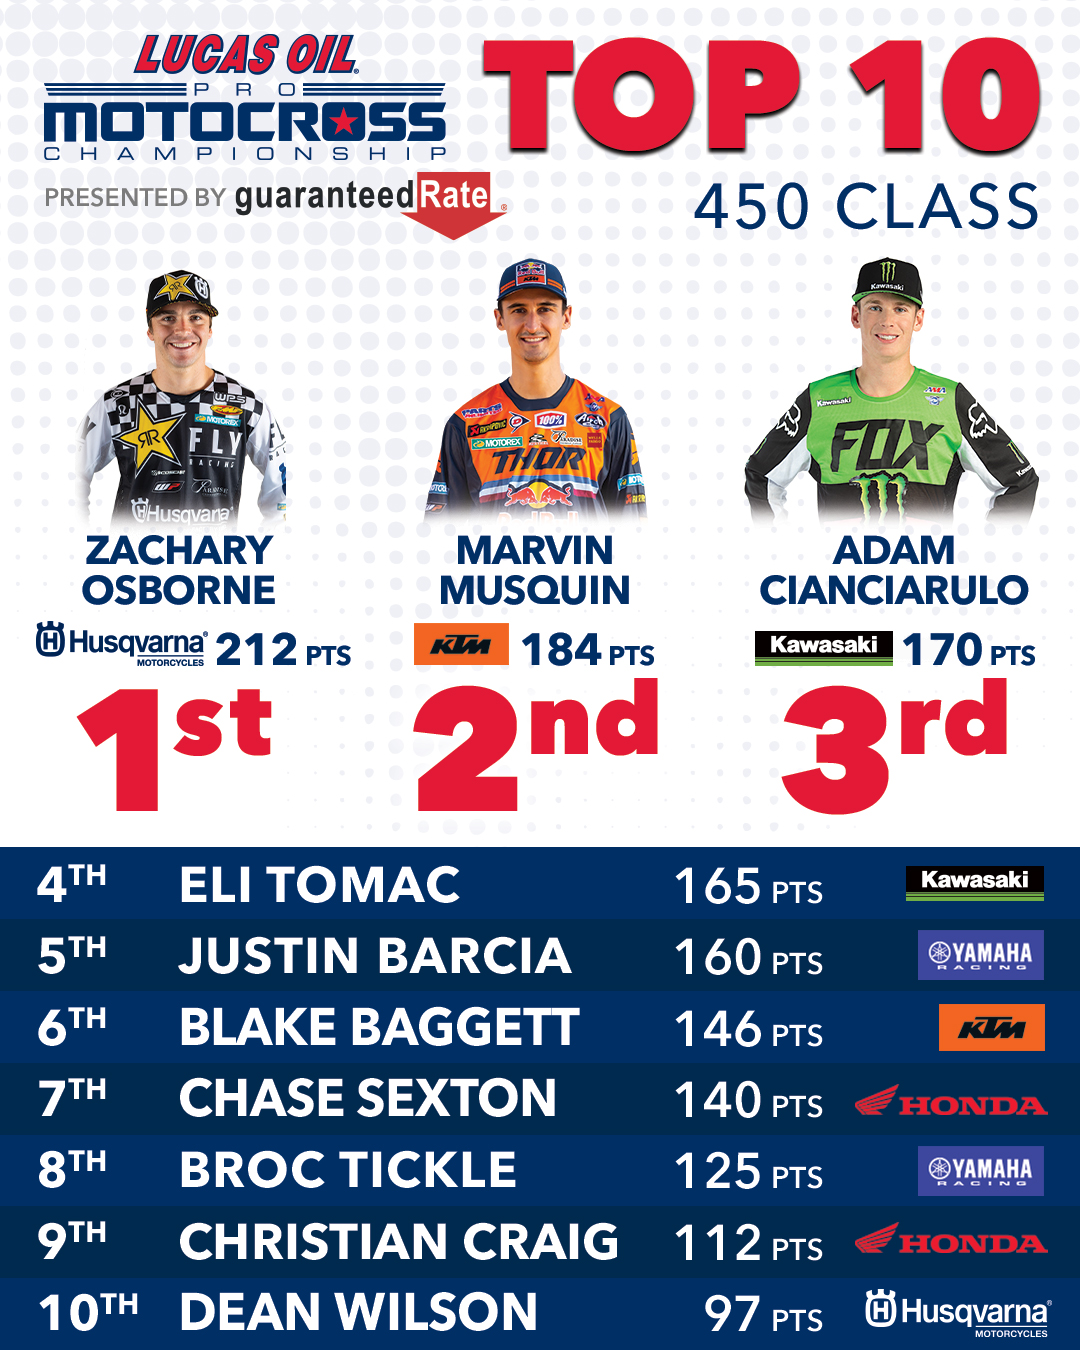 200911 Lucas Oil Pro Motocross - Top 10 450 Class